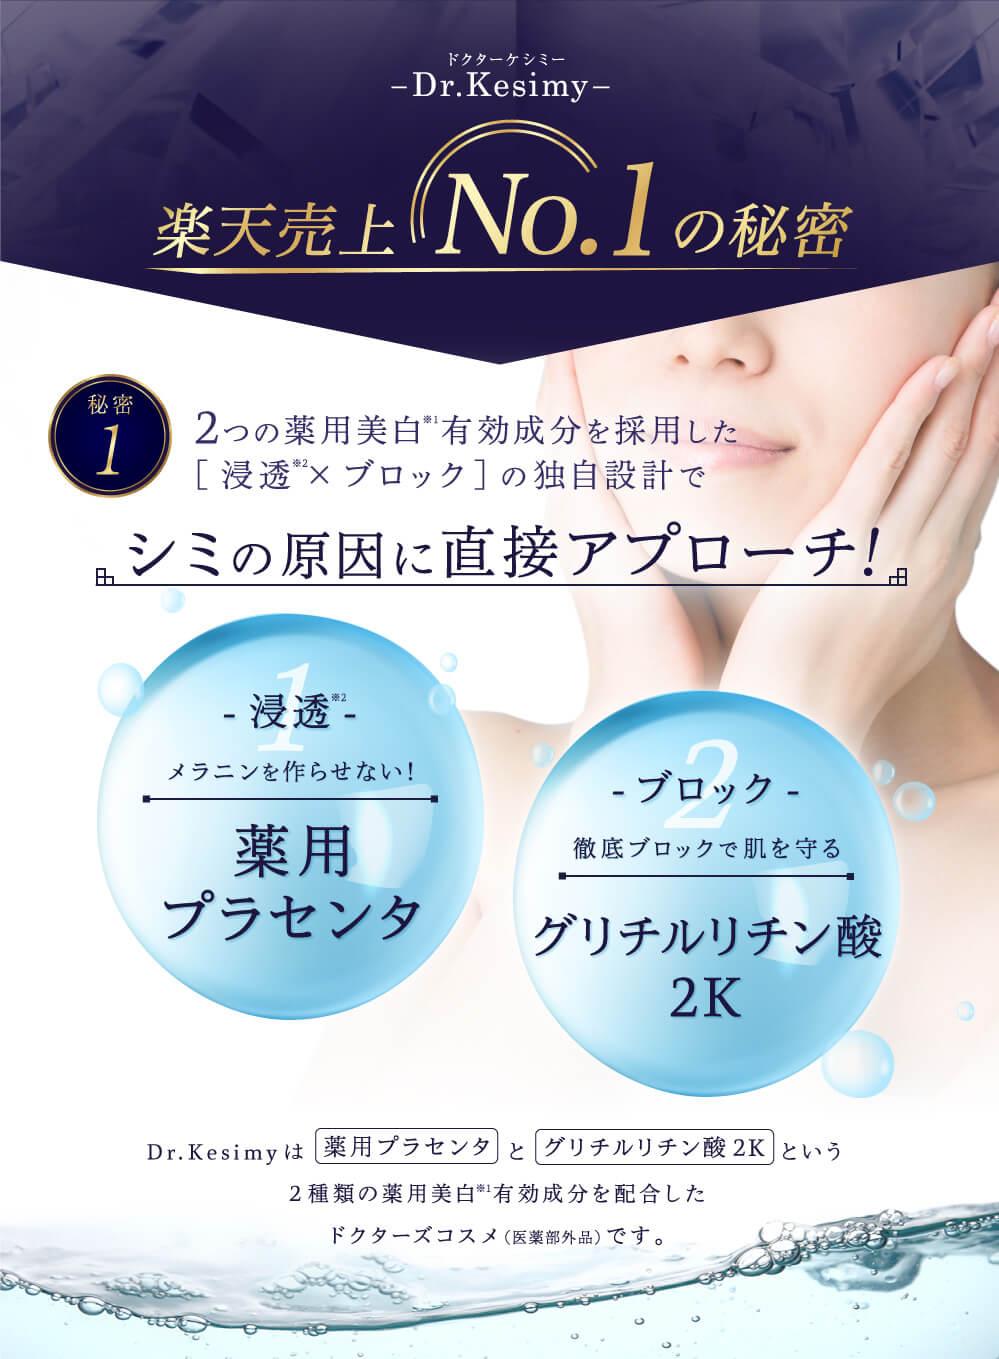 Dr.Kesimy-ドクターケシミー-楽天売上No.1の秘密